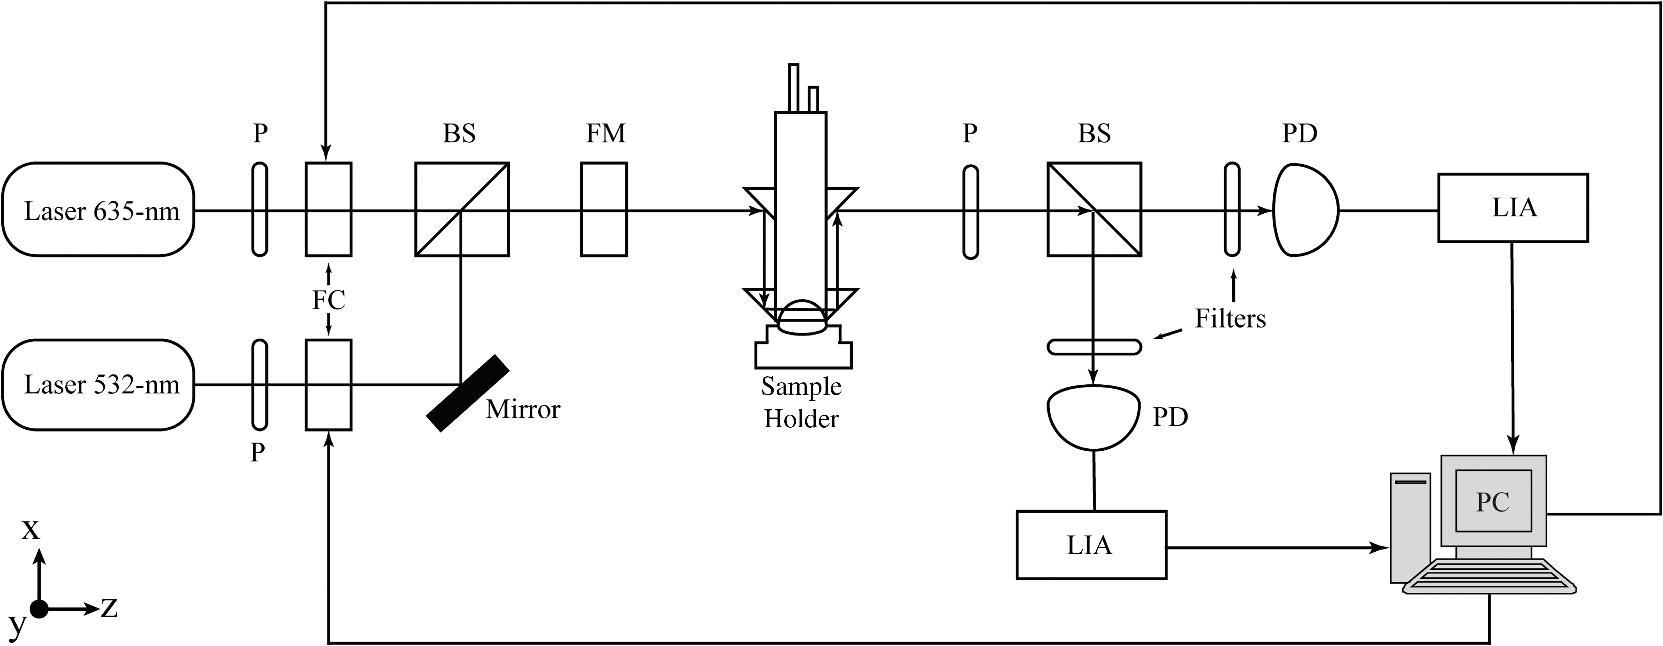 Dual Wavelength Polarimetric Glucose Sensing In The Presence Of Amplifiers And Lockin Simplified Schematic All P Polarizer Fc Faraday Compensator Bs Beam Splitter Fm Modulator Pd Photodetector Lia Lock